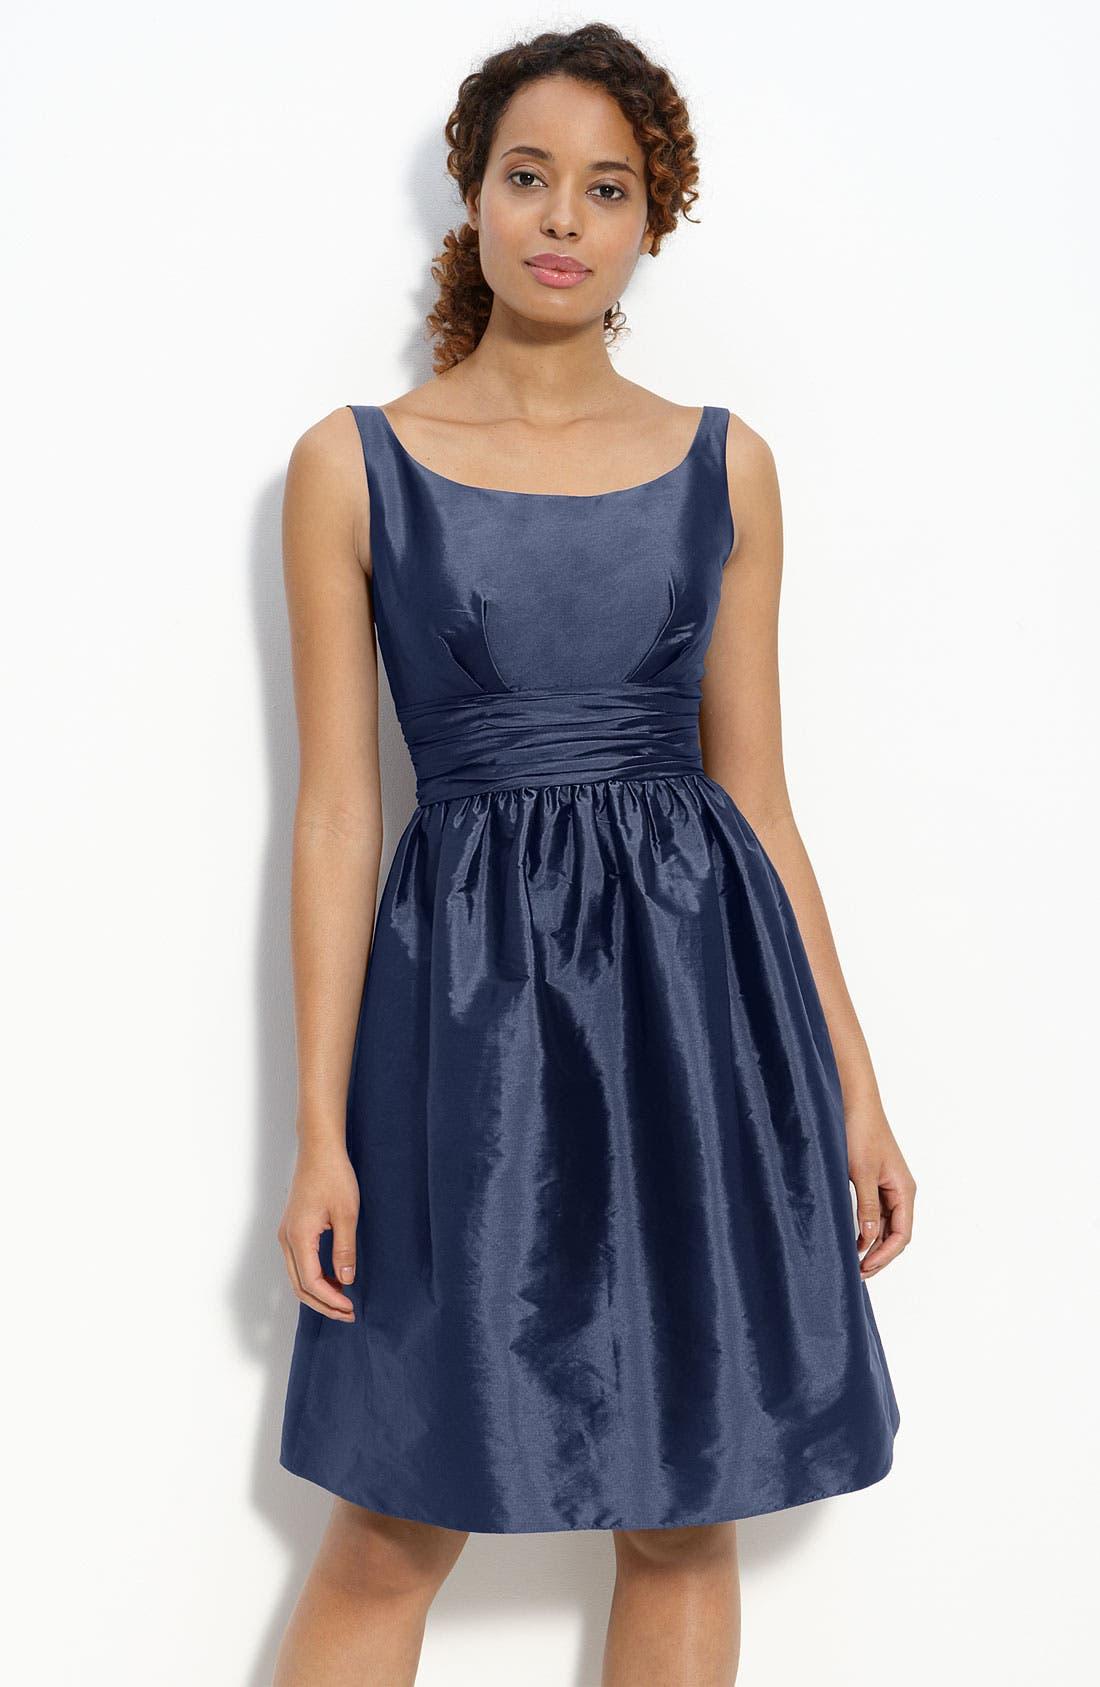 Alternate Image 1 Selected - Eliza J Sleeveless Taffeta Dress